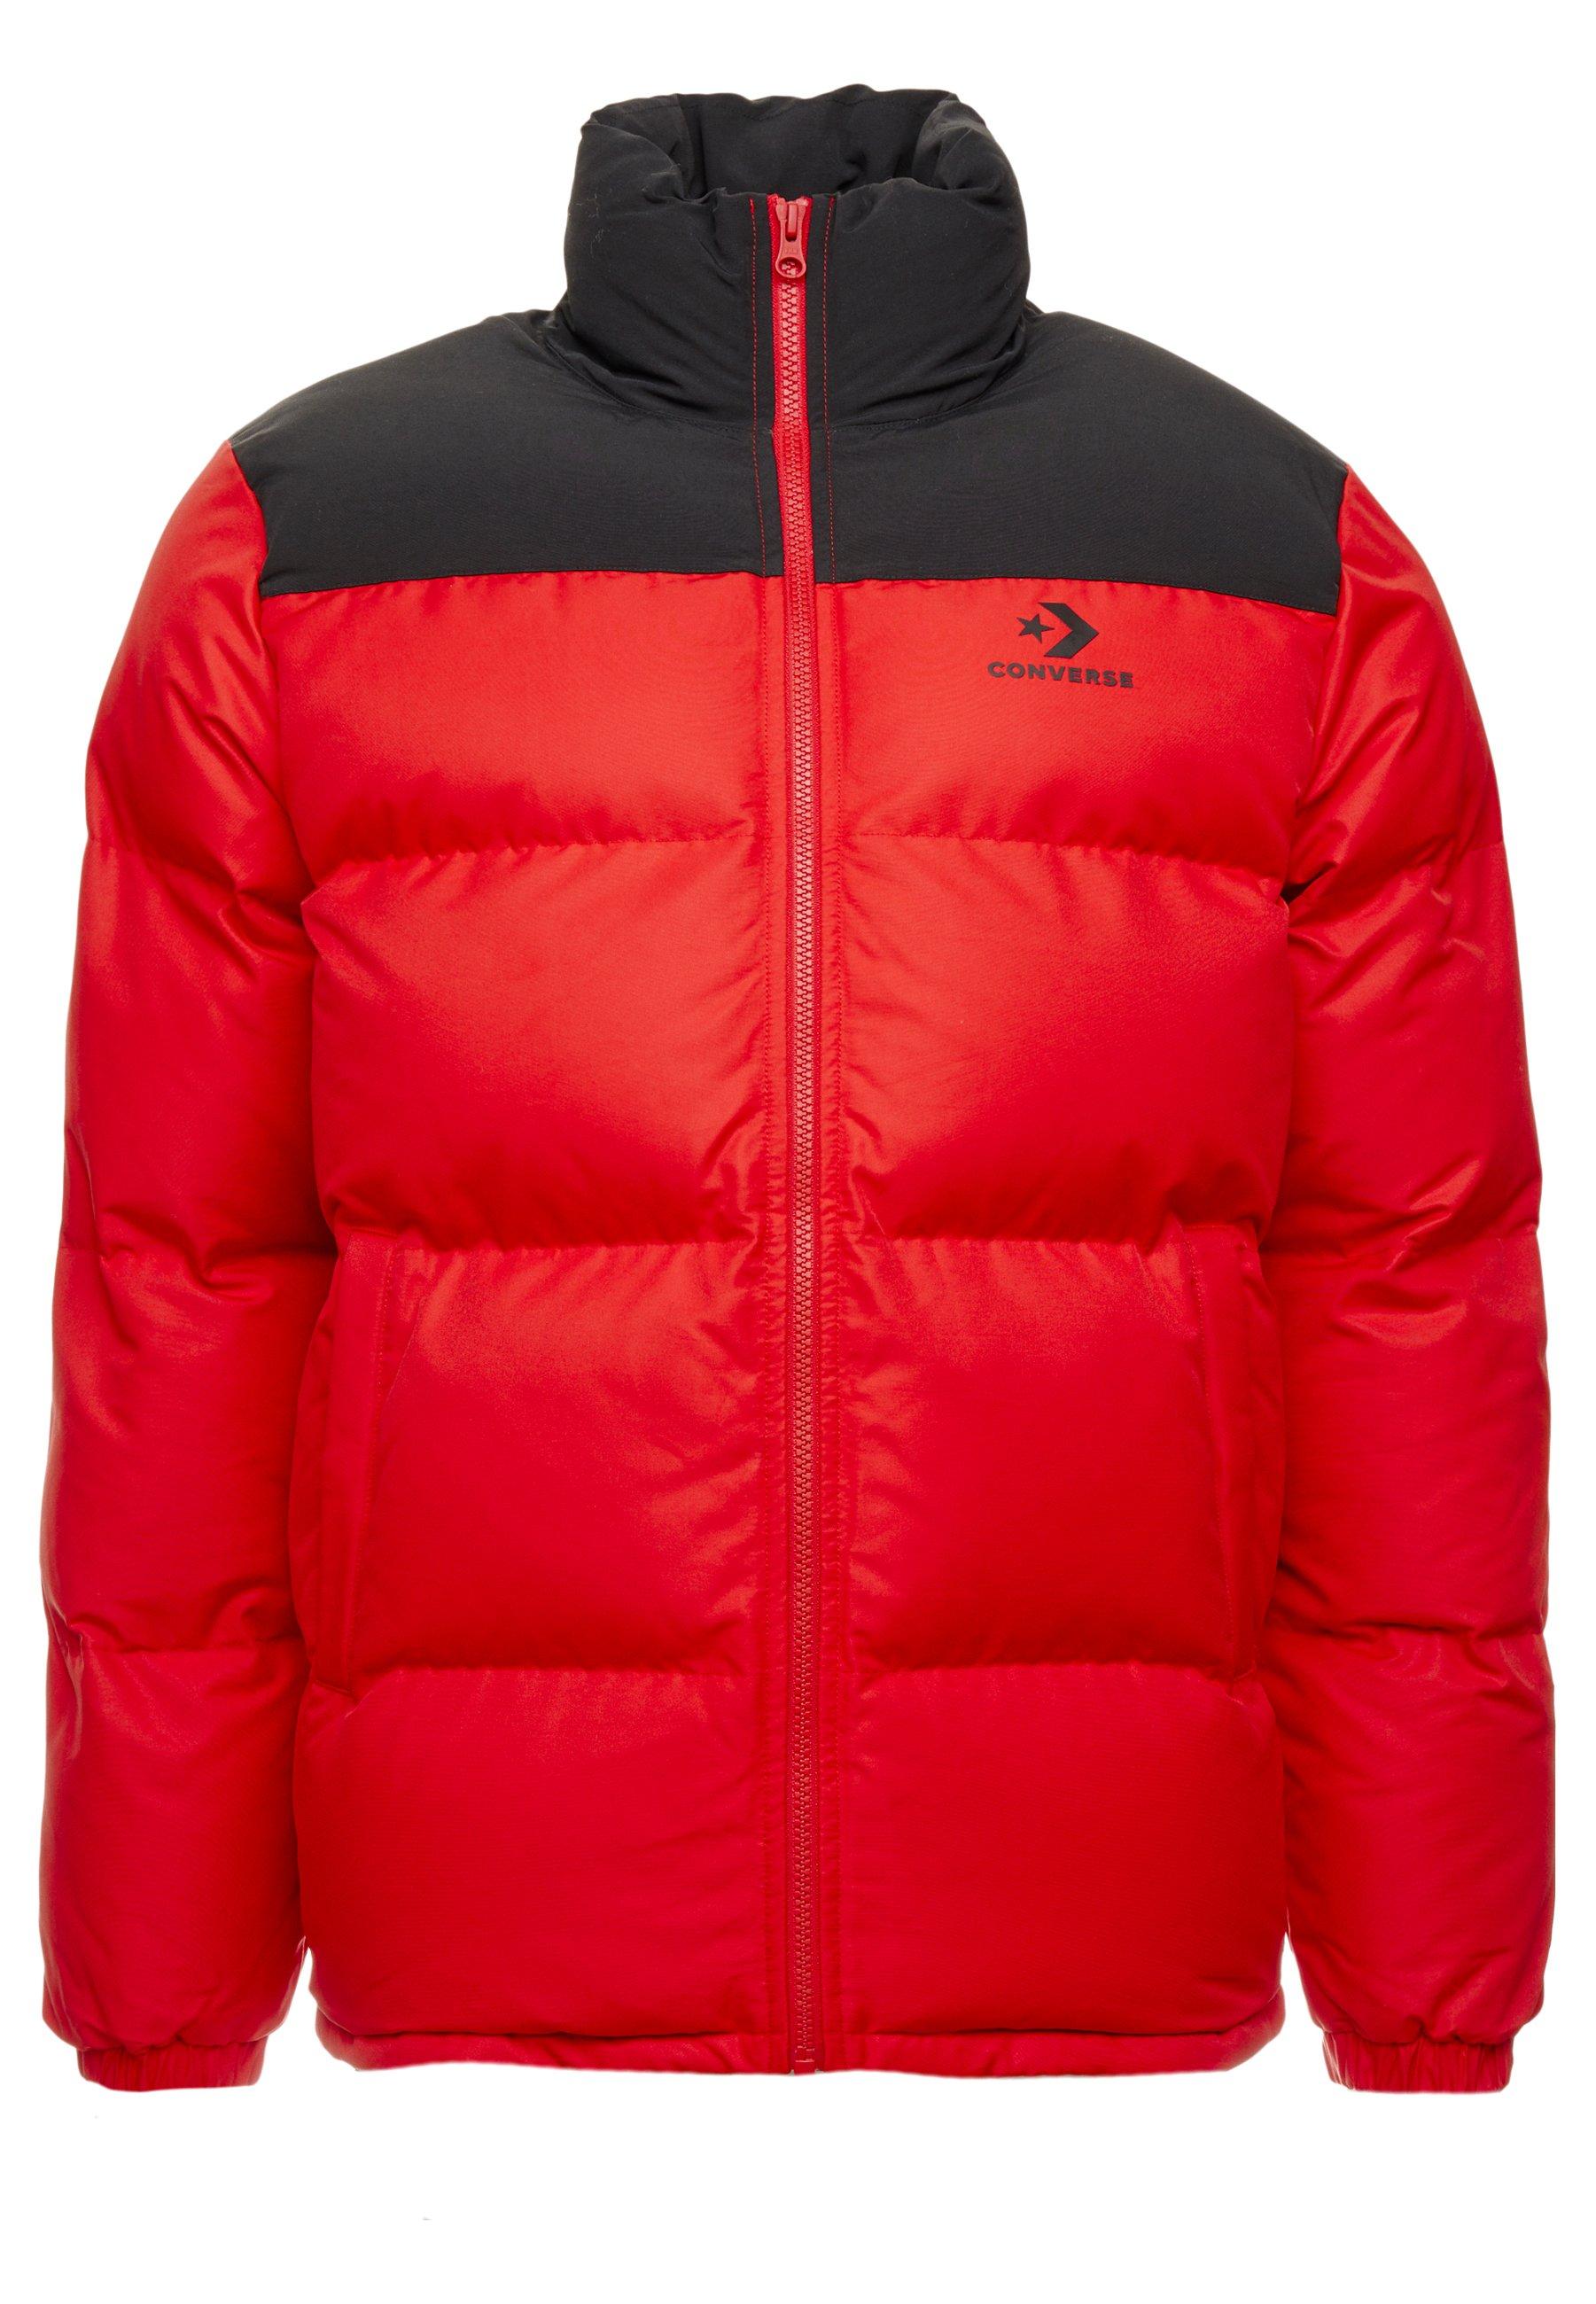 Converse Fill Puffer Jacket - Vinterjacka Enamel Red